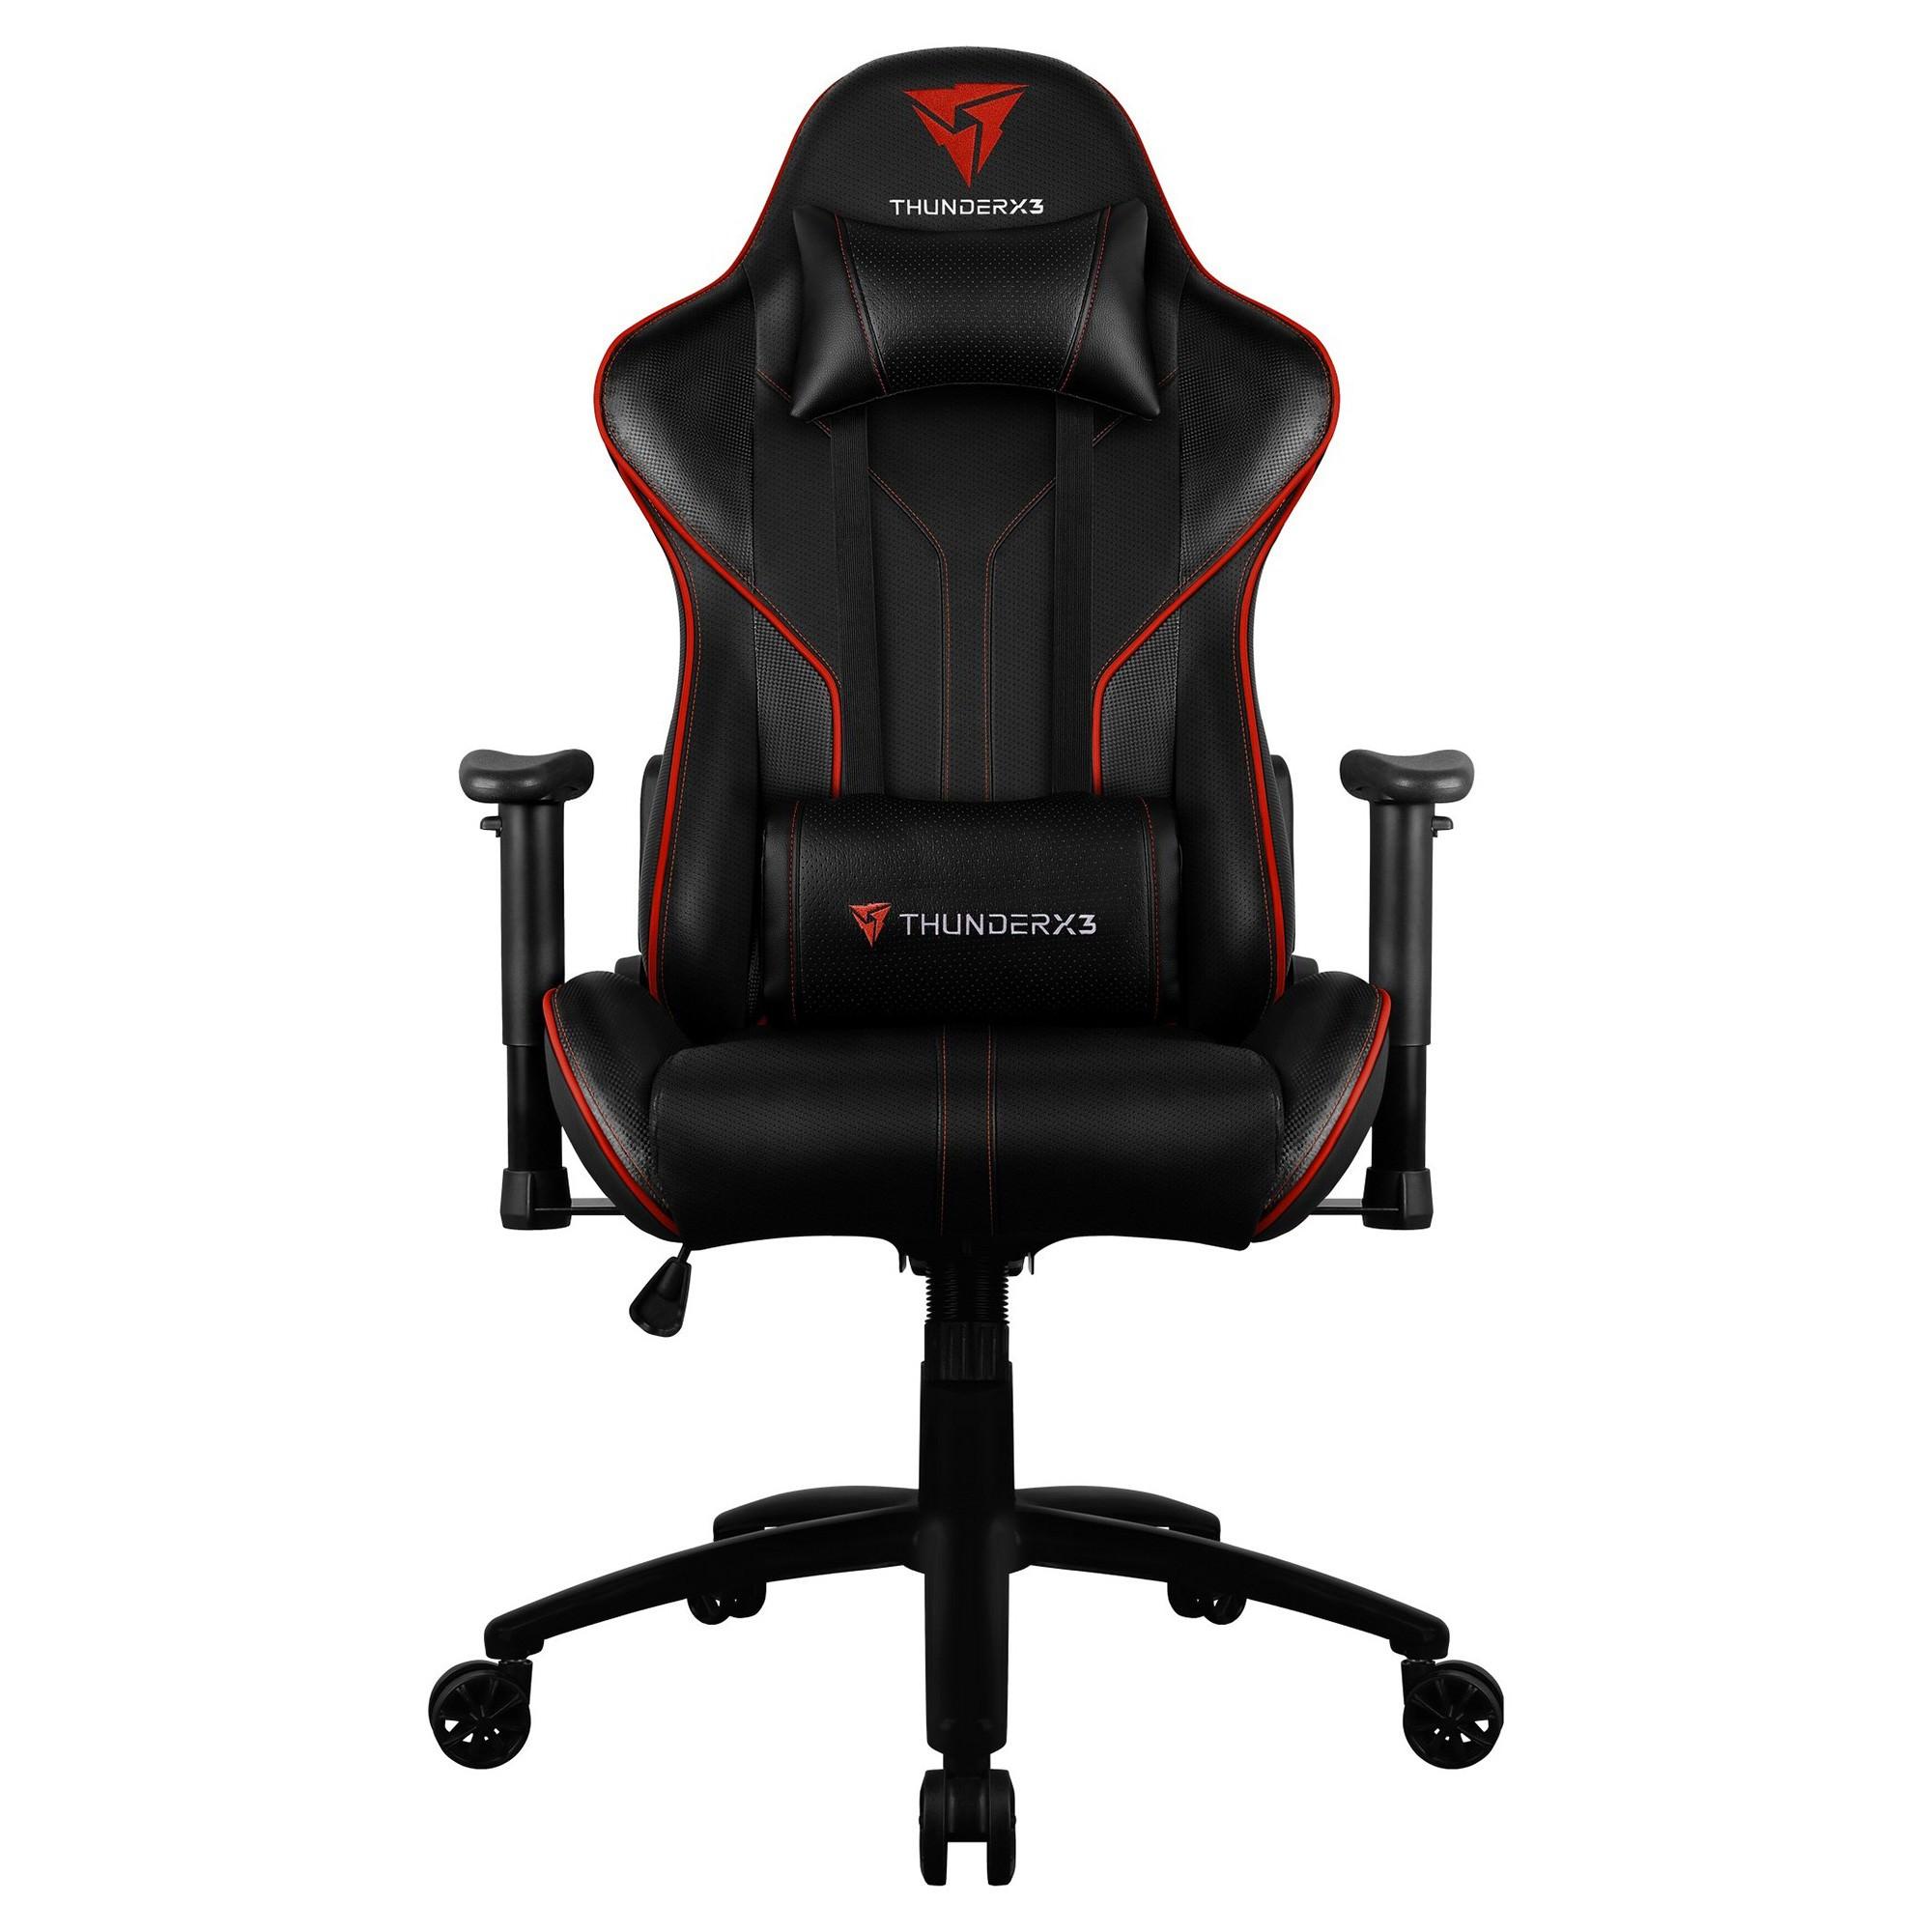 ThunderX3 RC3 HEX RGB Lighting Gaming Chair, Black / Red